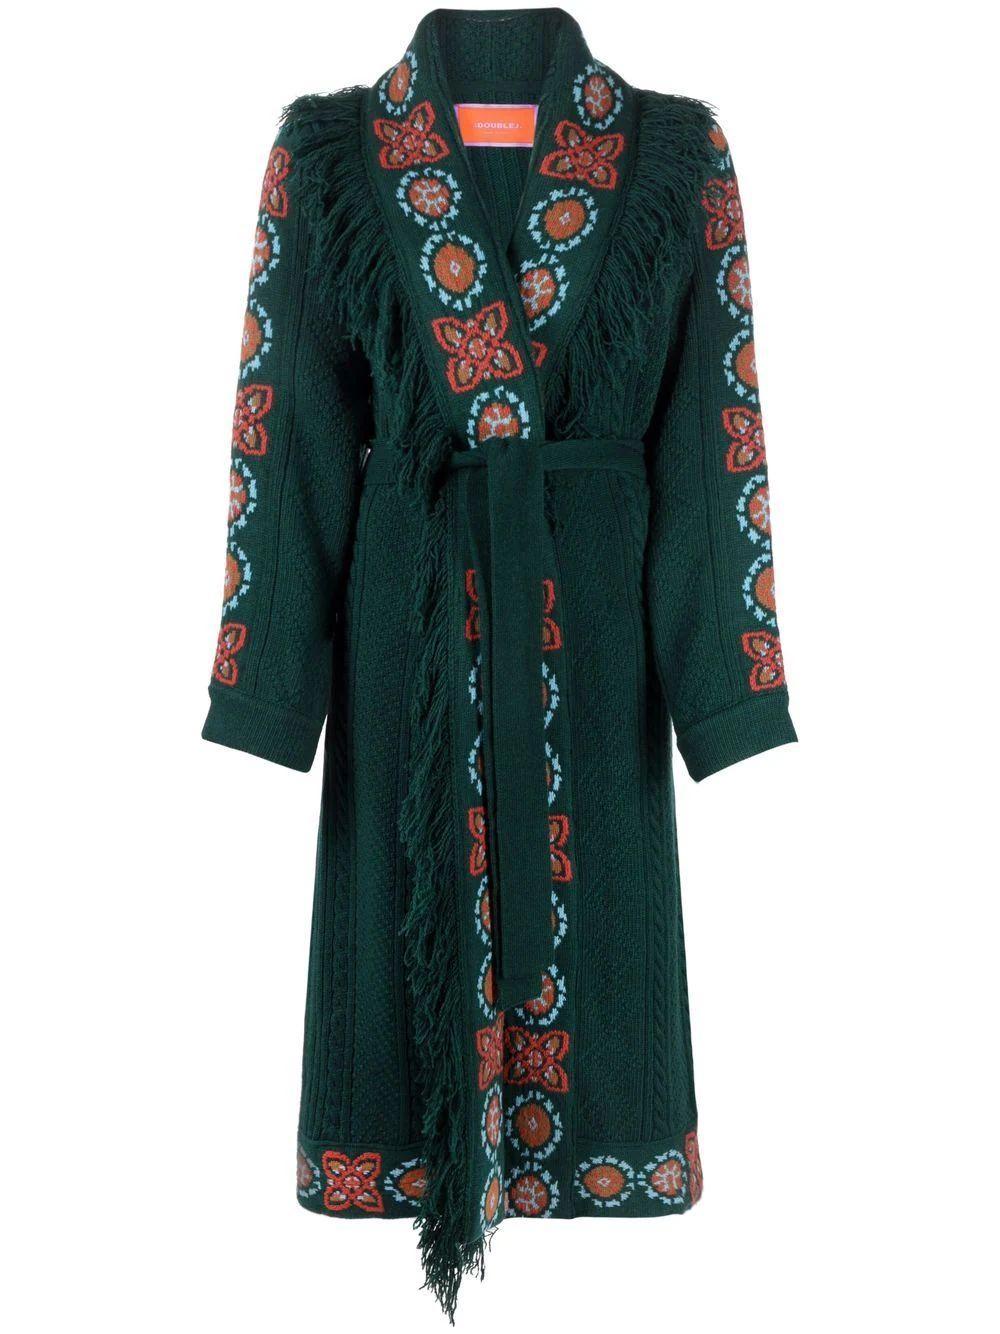 Intarsia- Knit Long Cardigan Item # JAC0032-KNI038